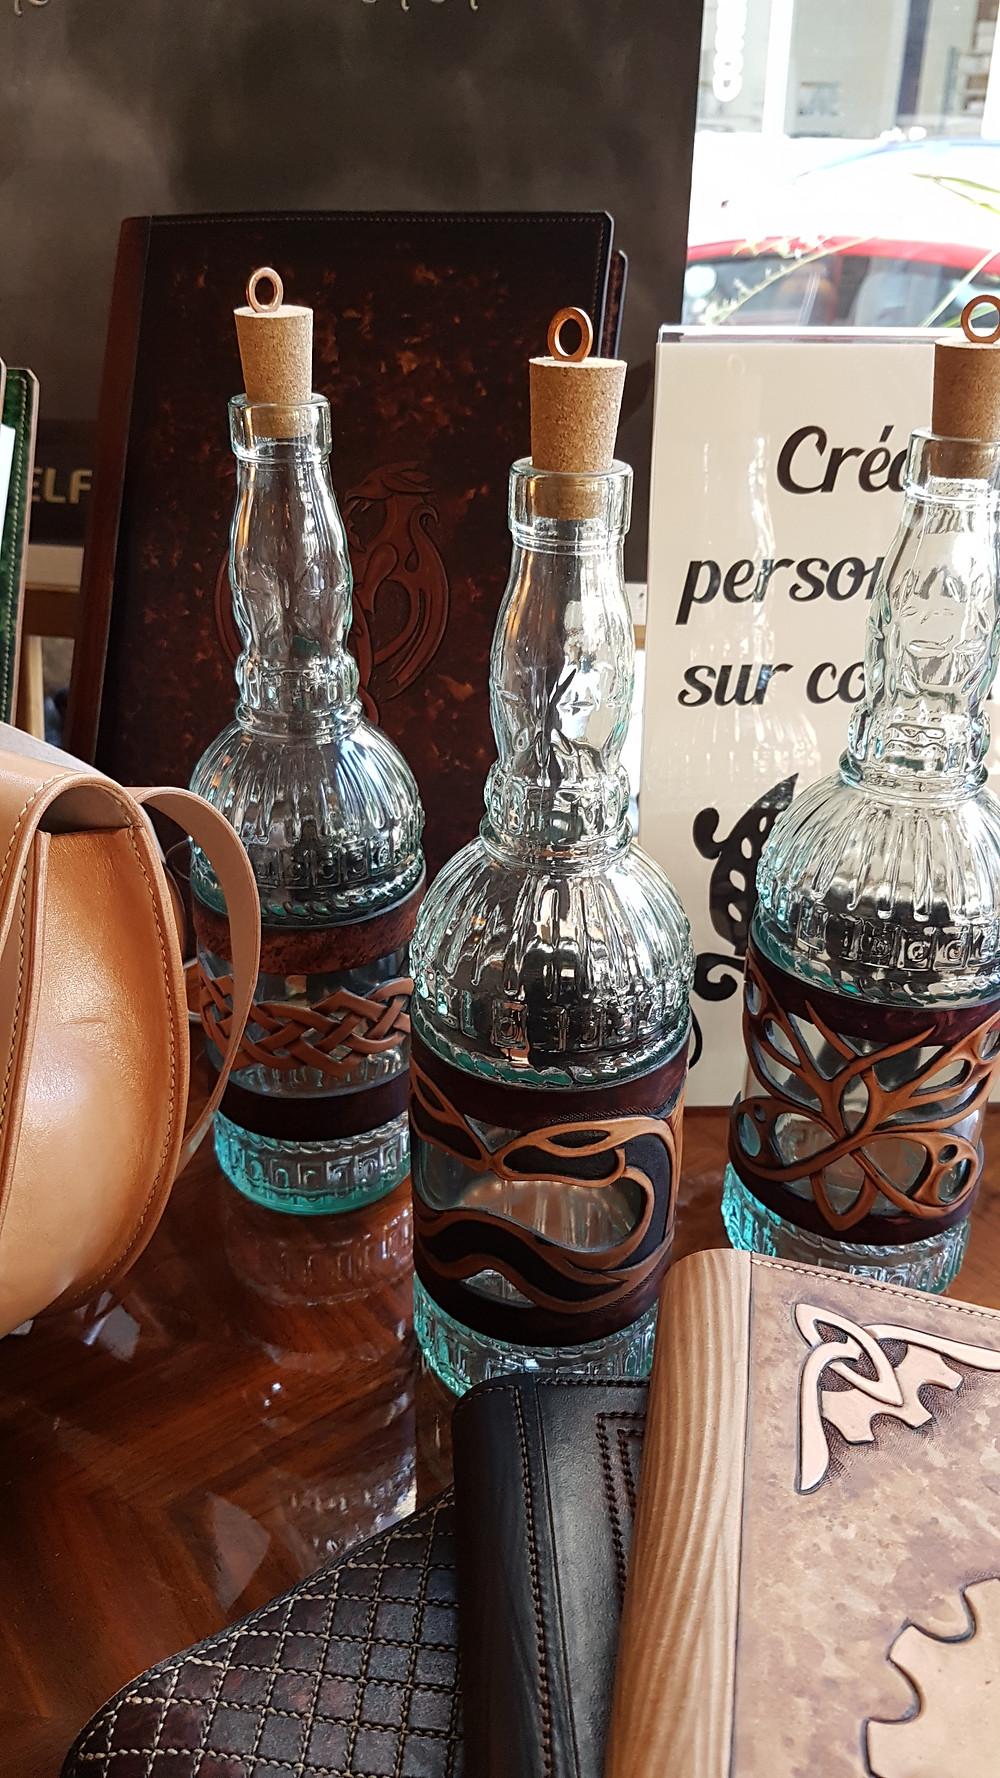 Décoration de table mariage alternatif, mariage steampunk, décoration steampunk, décoration mariage atypique, décoration cuir, sur-mesure